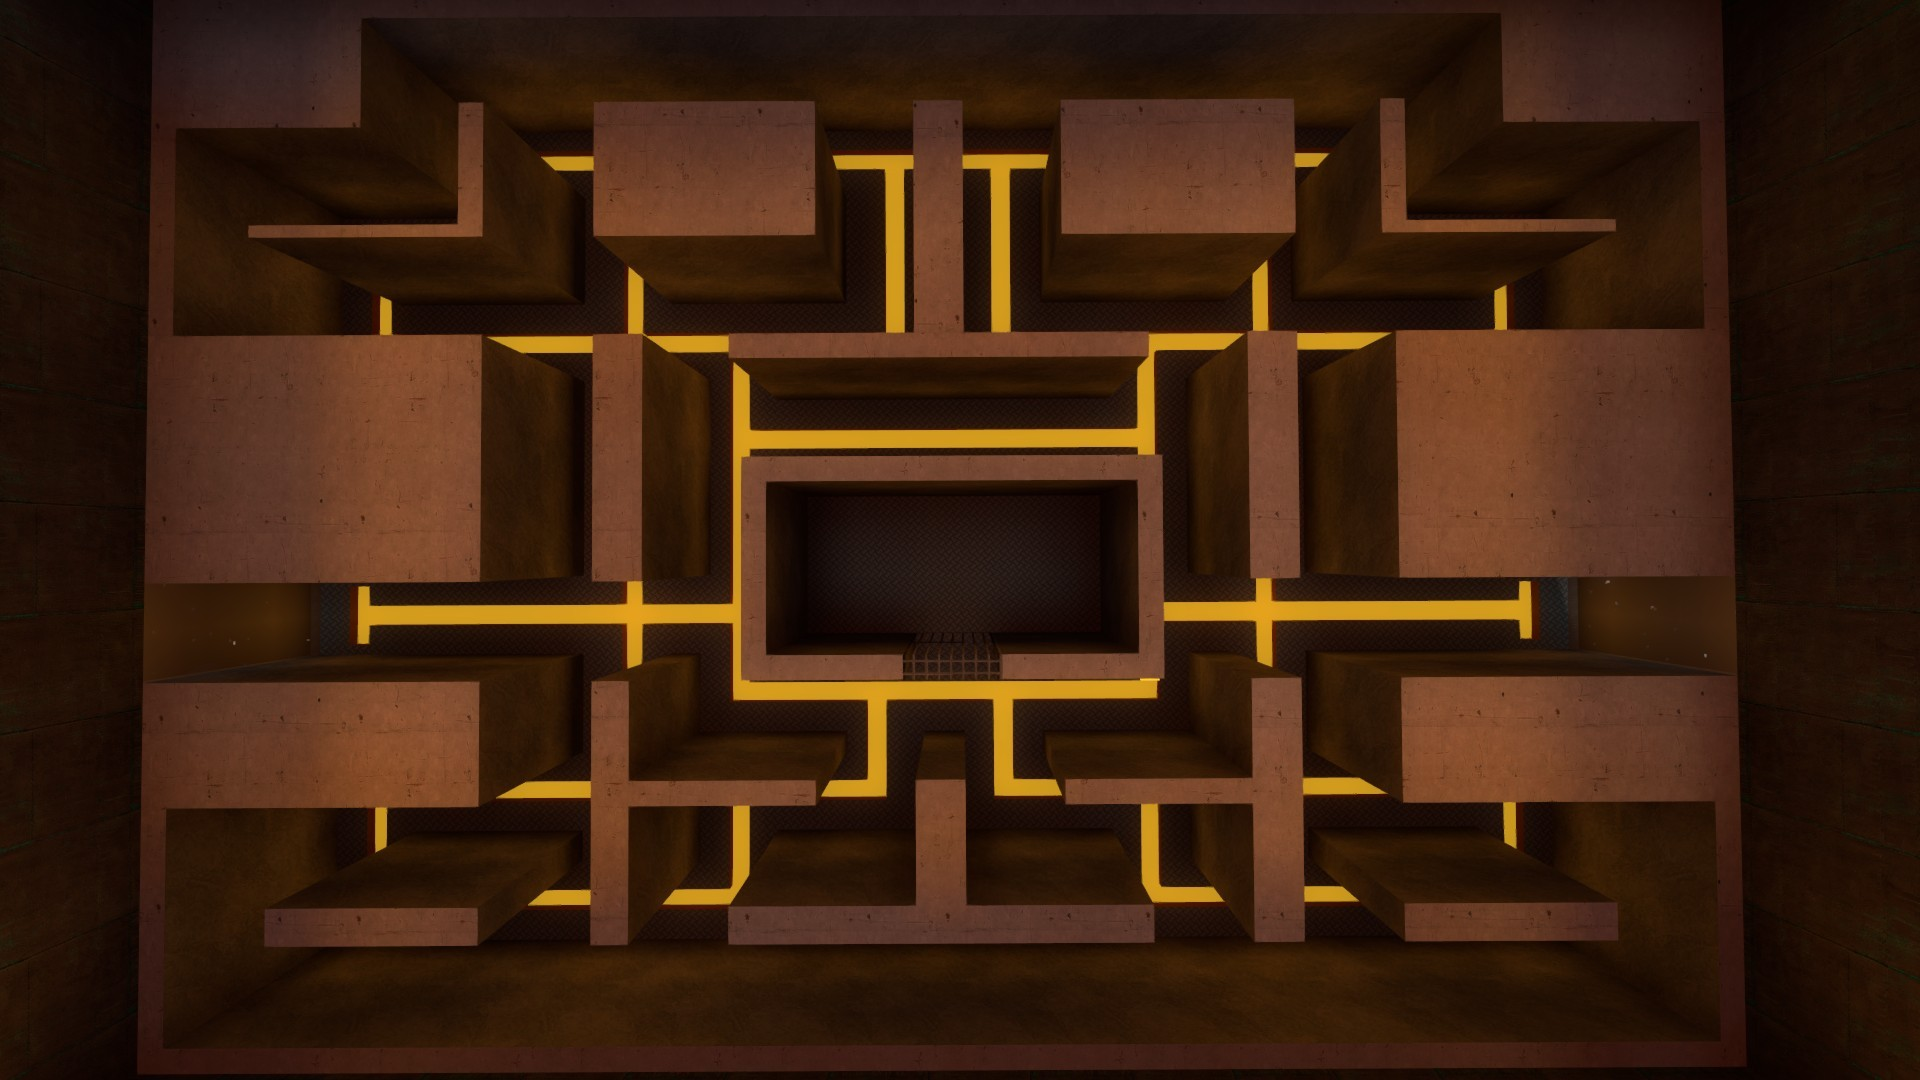 mg_ghosts_multigame_v2 WiP screenshot #1